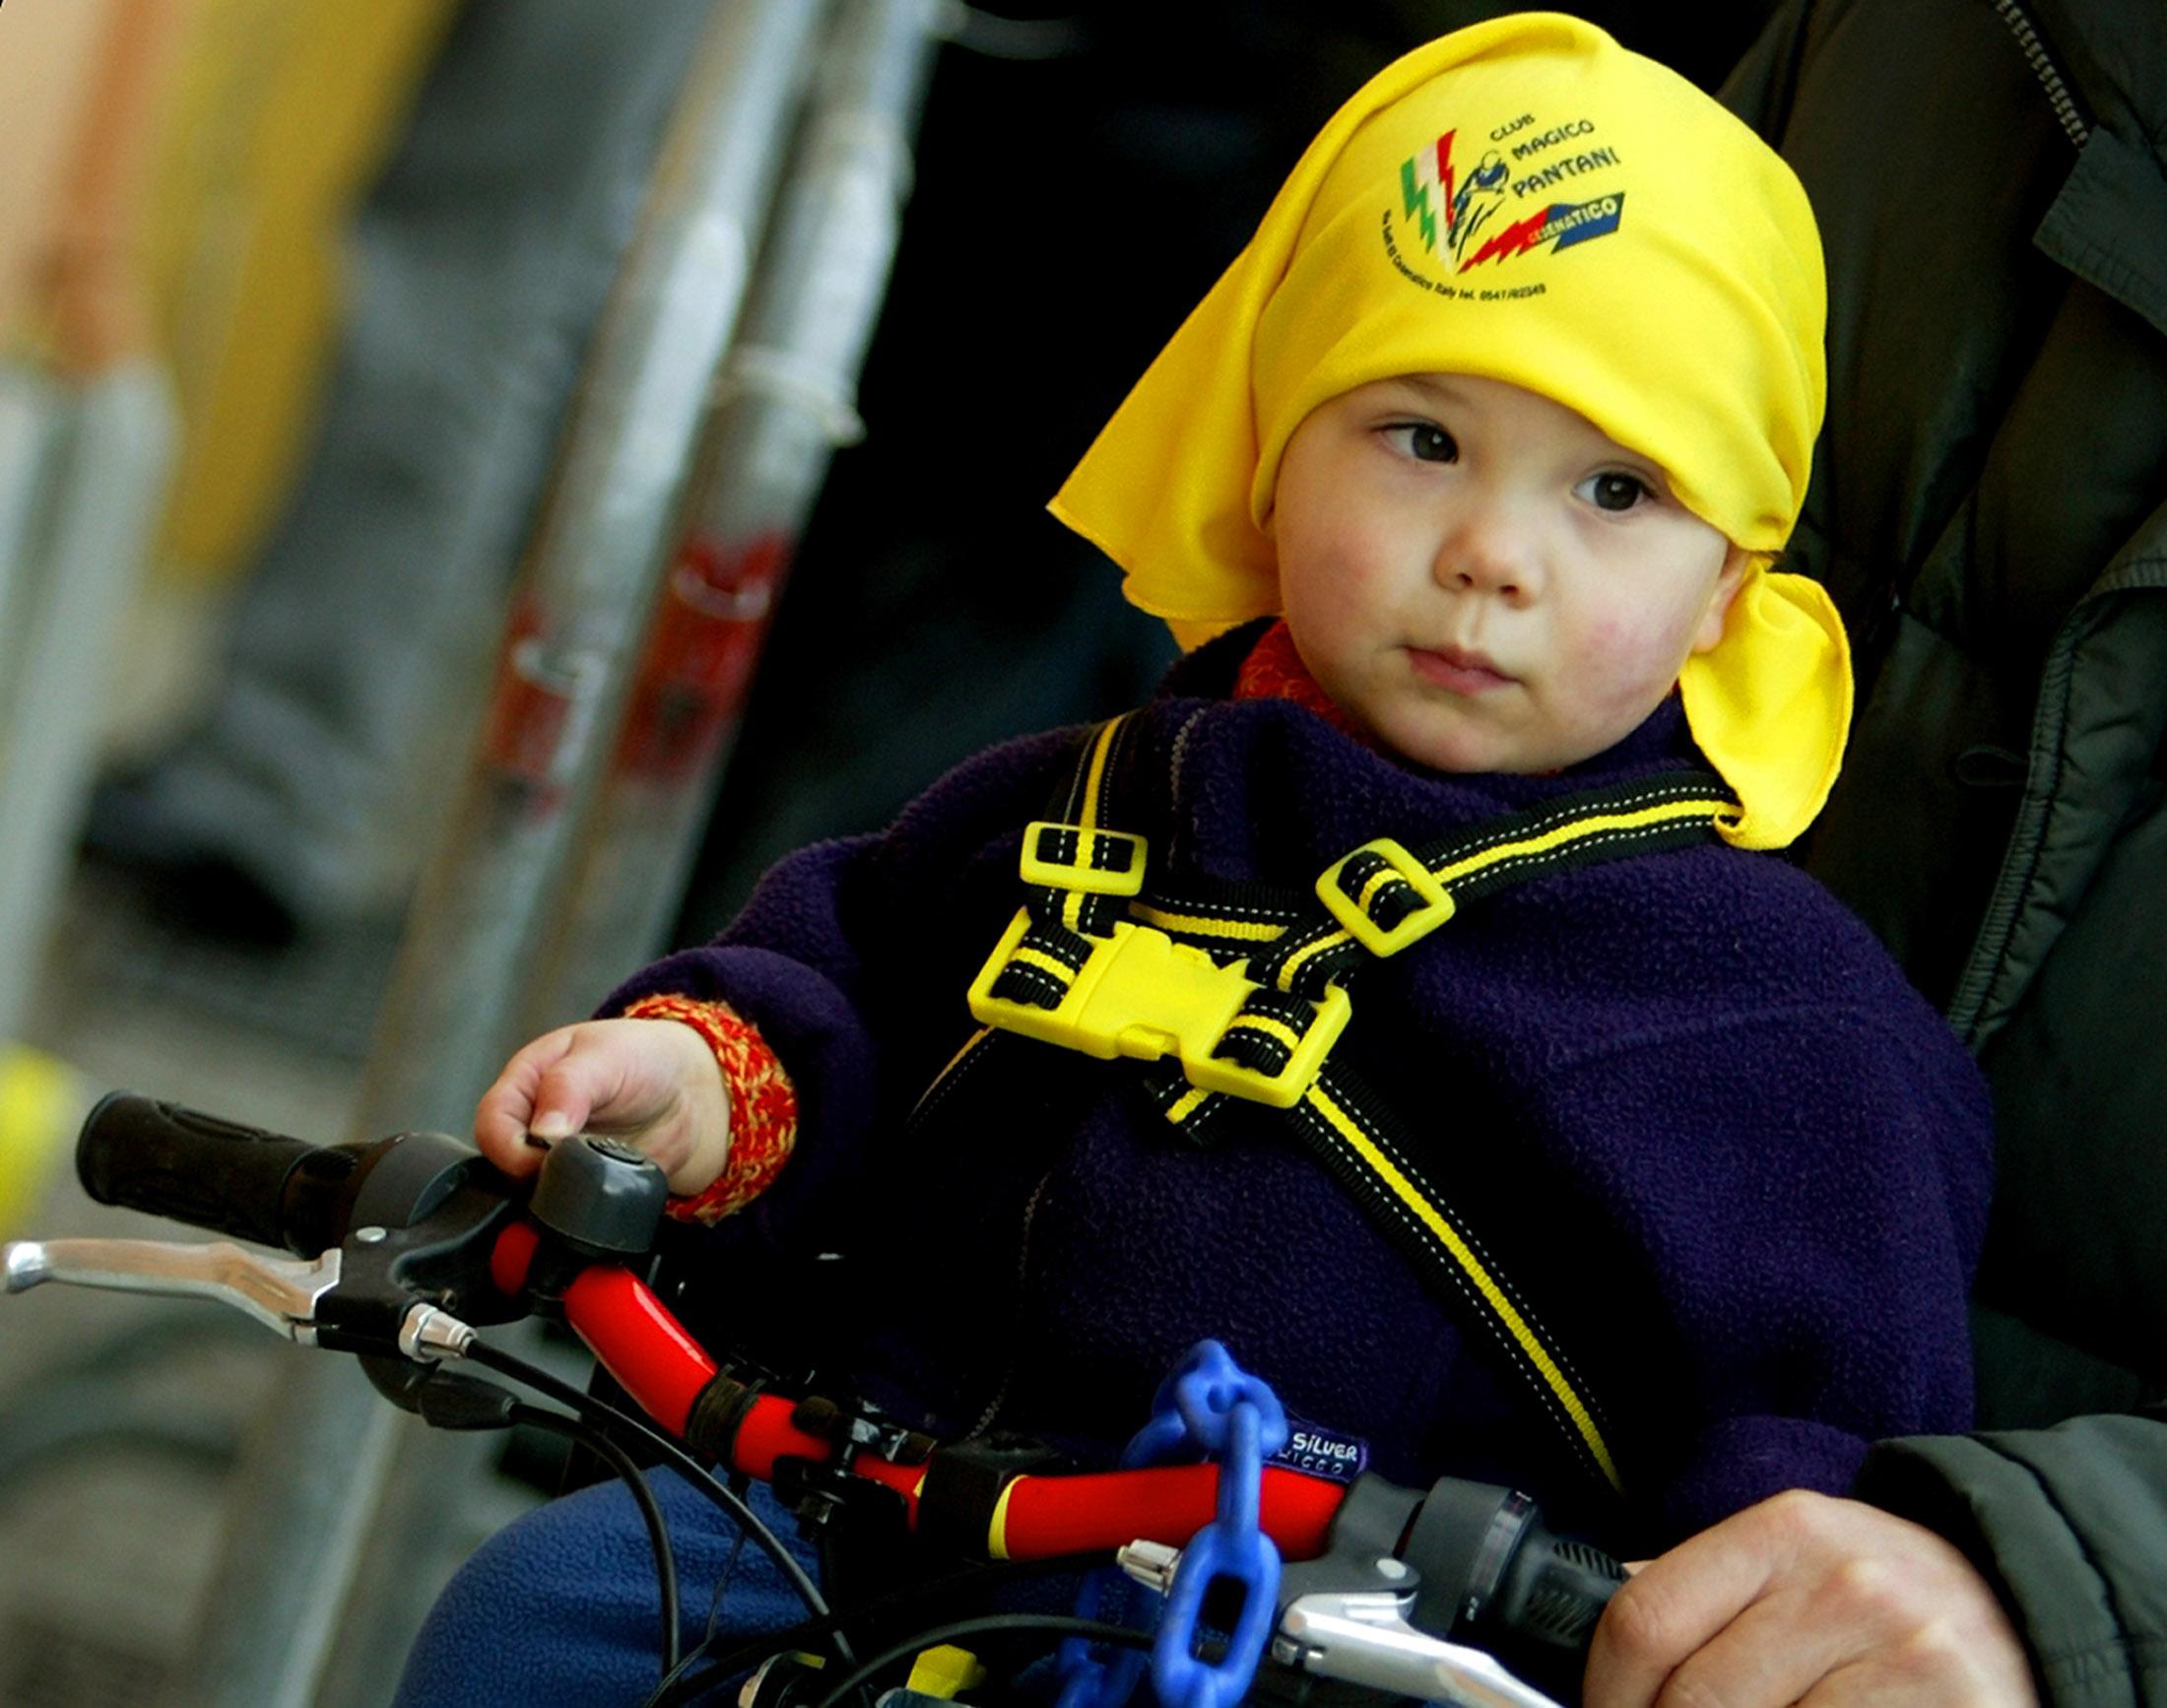 En liten tifosi med Pantani-bandana. FOTO ANSA/Stefano Rellandini